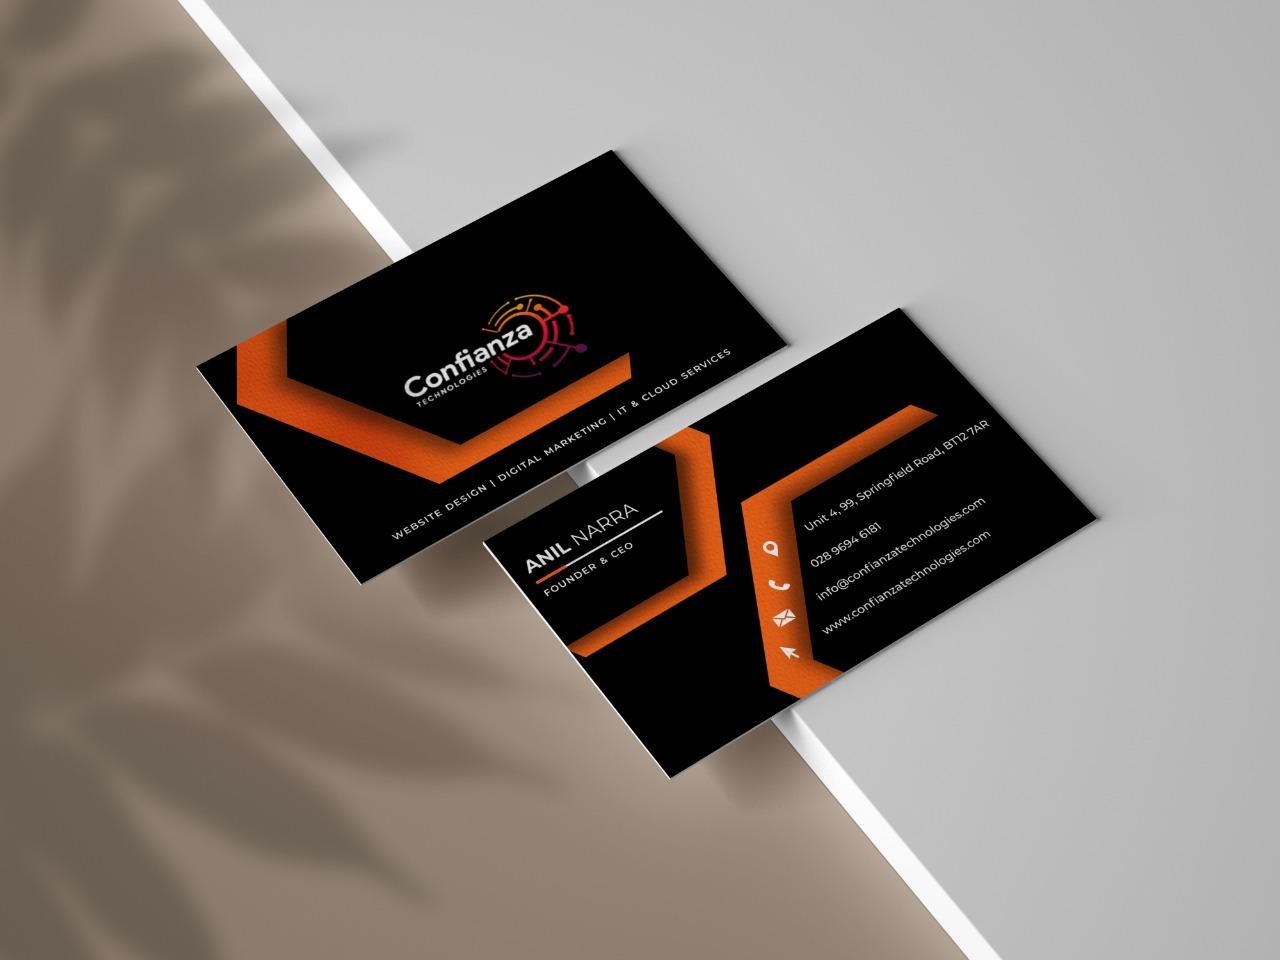 Business Cards Design for Confianza Technologies